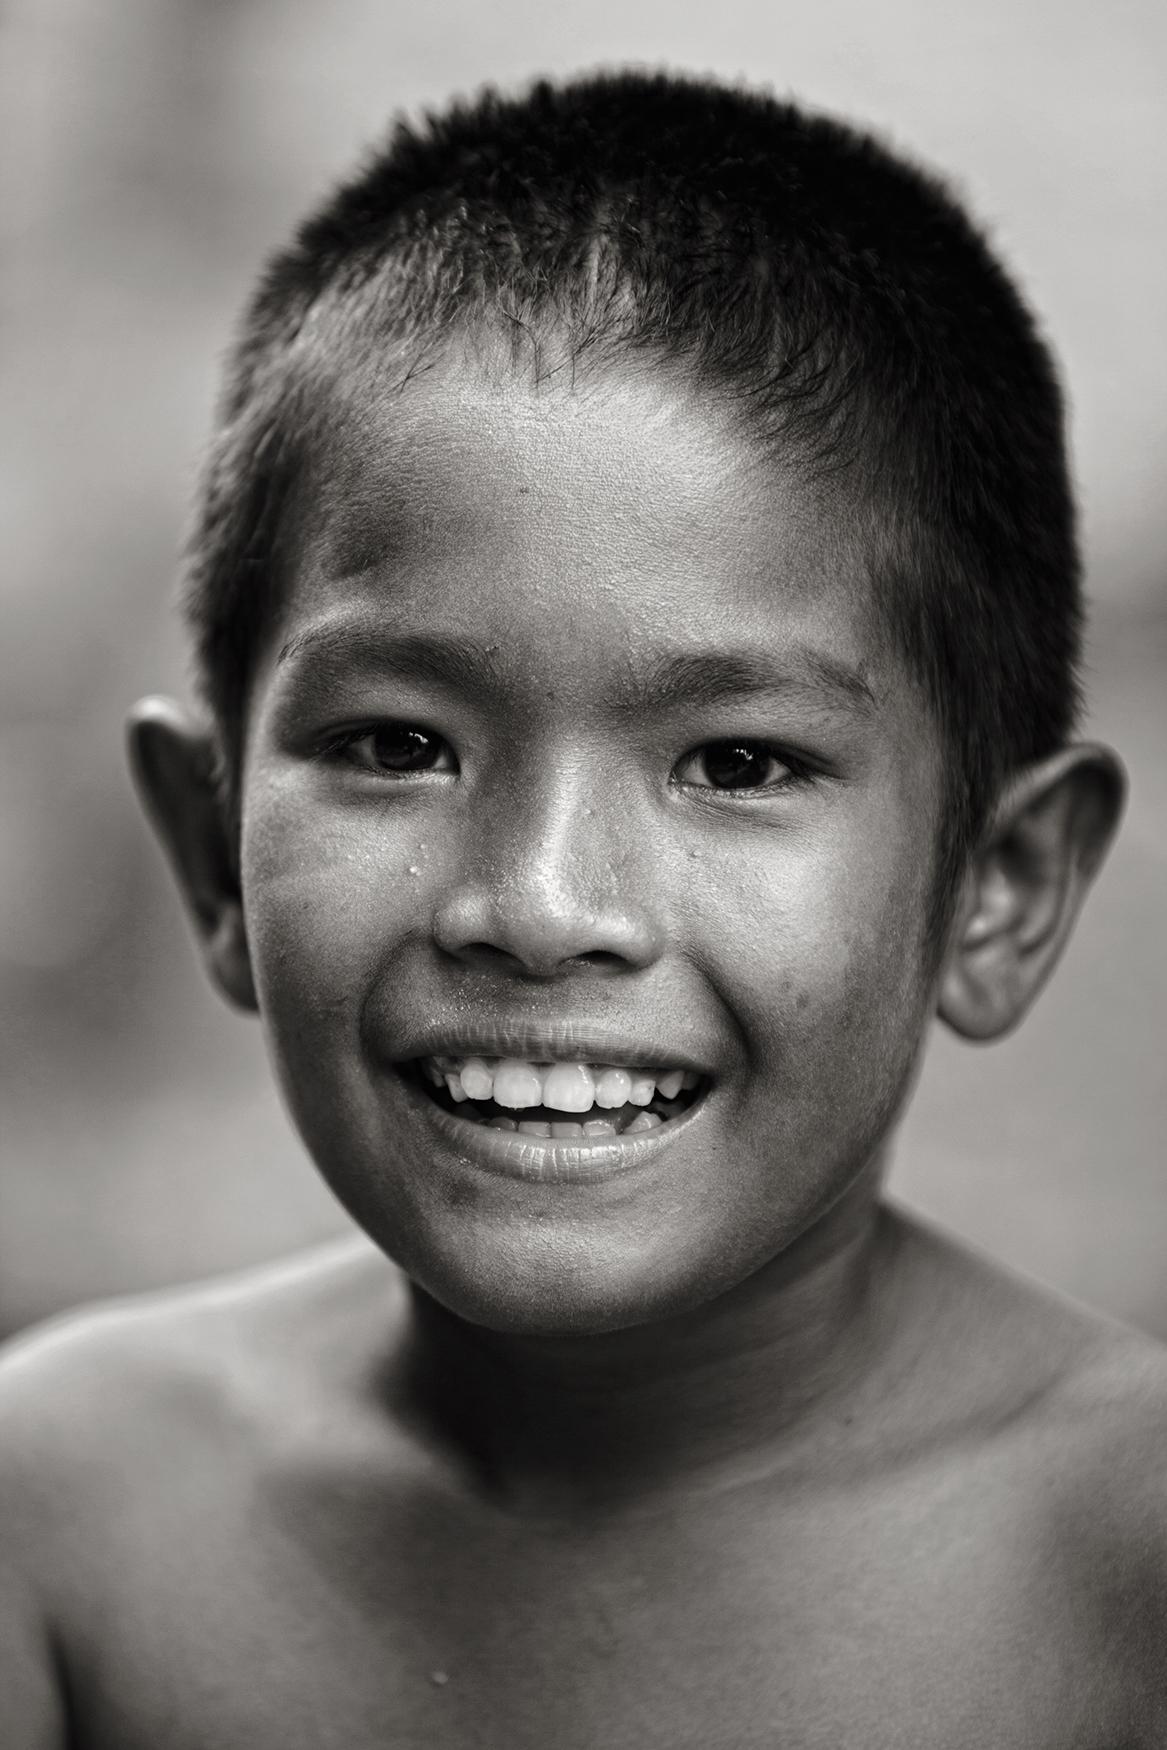 Indonesian Visage 04